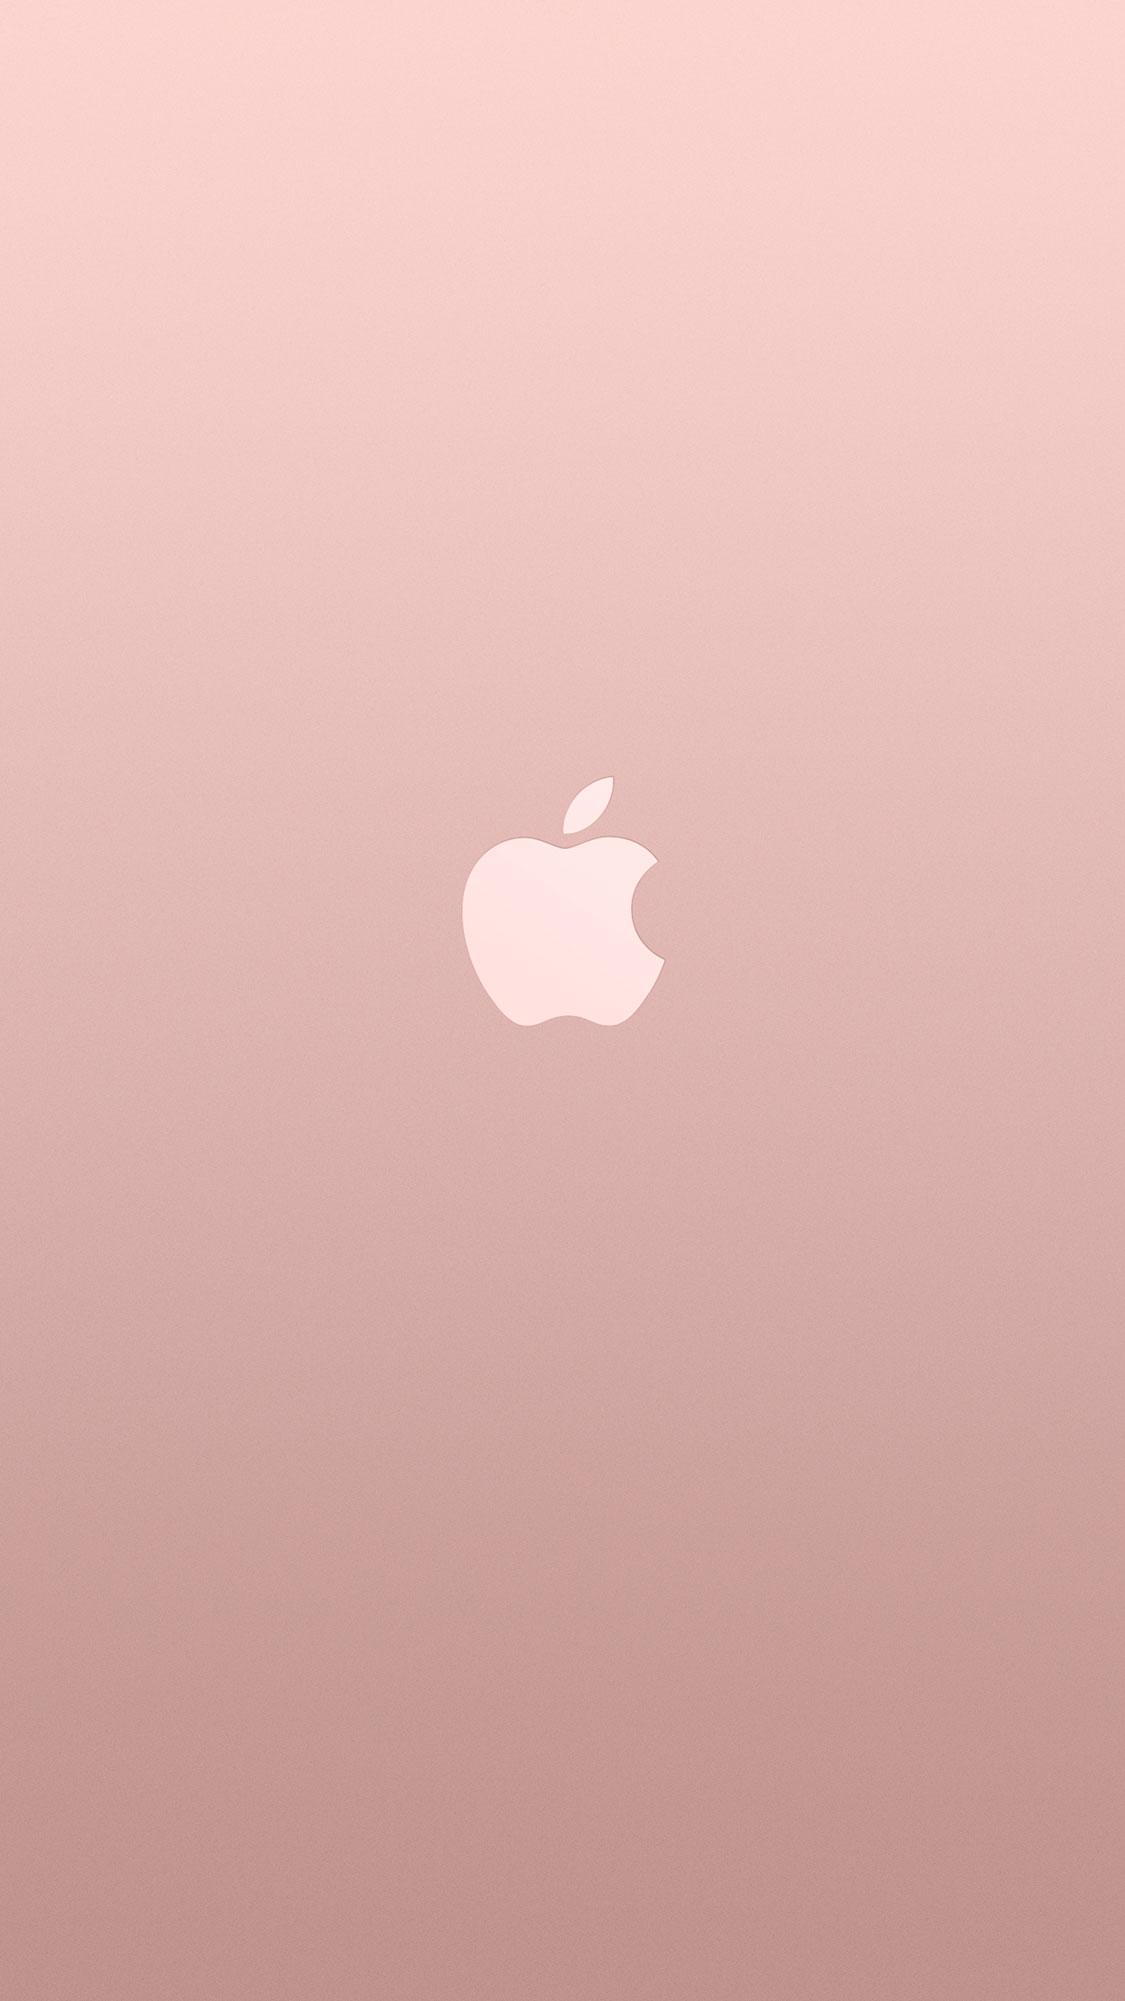 Iphone-Rose-Gold-iphonerosegold-wallpaper-wp426576